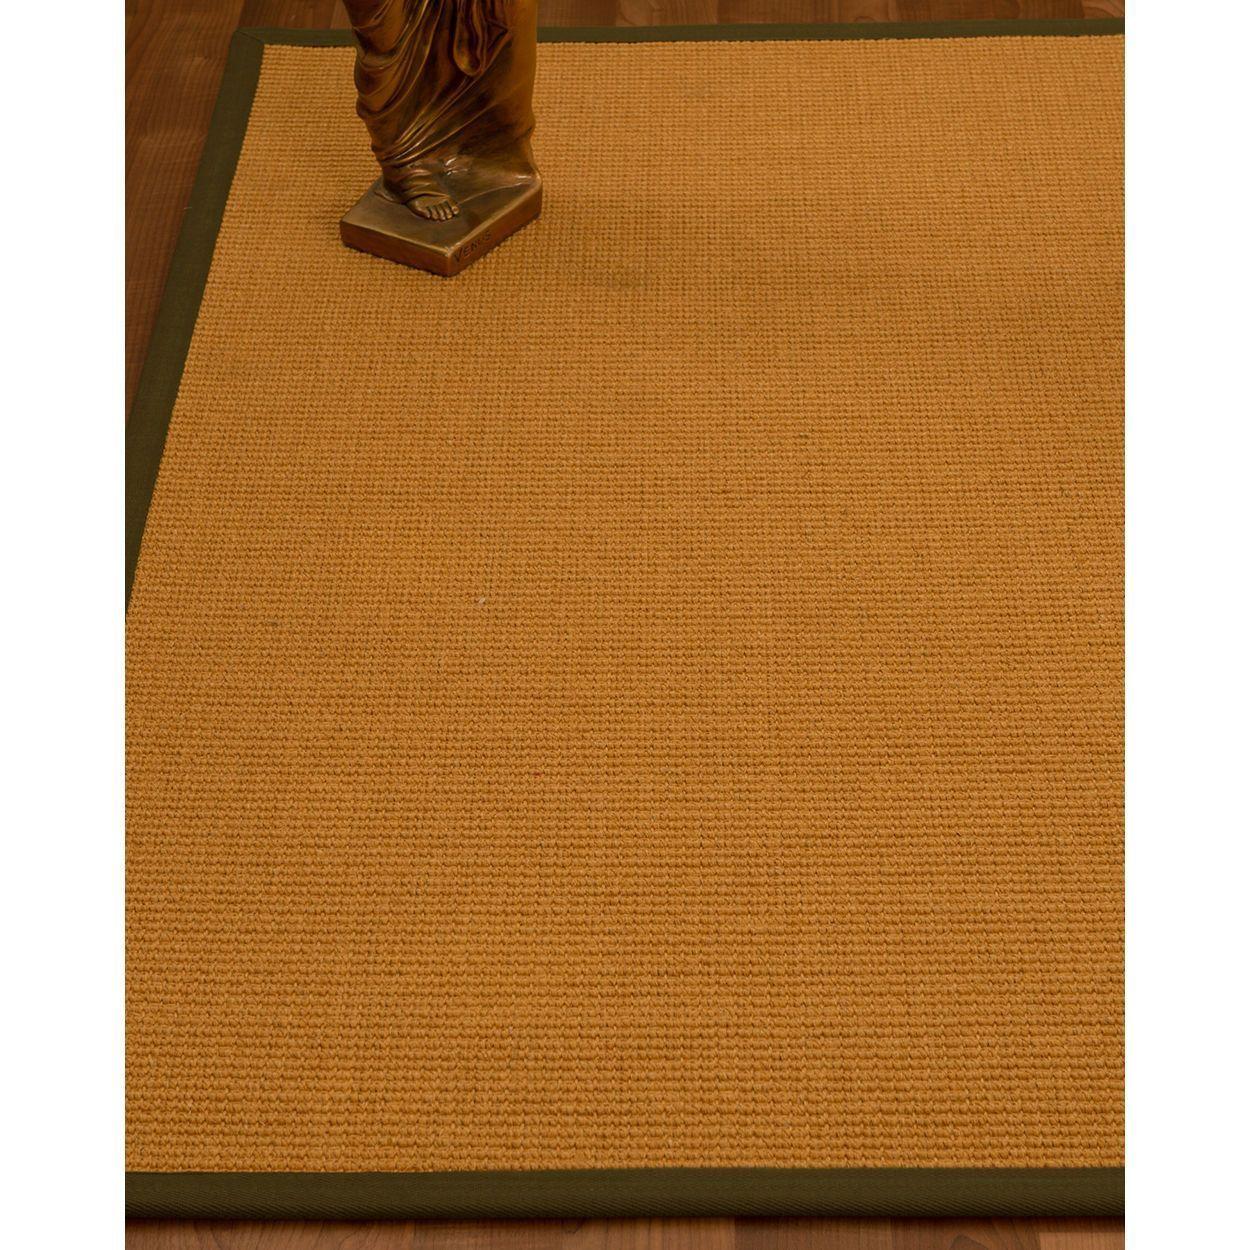 Handcrafted Davlin Natural Sisal Rug Fudge Binding 5' X 8